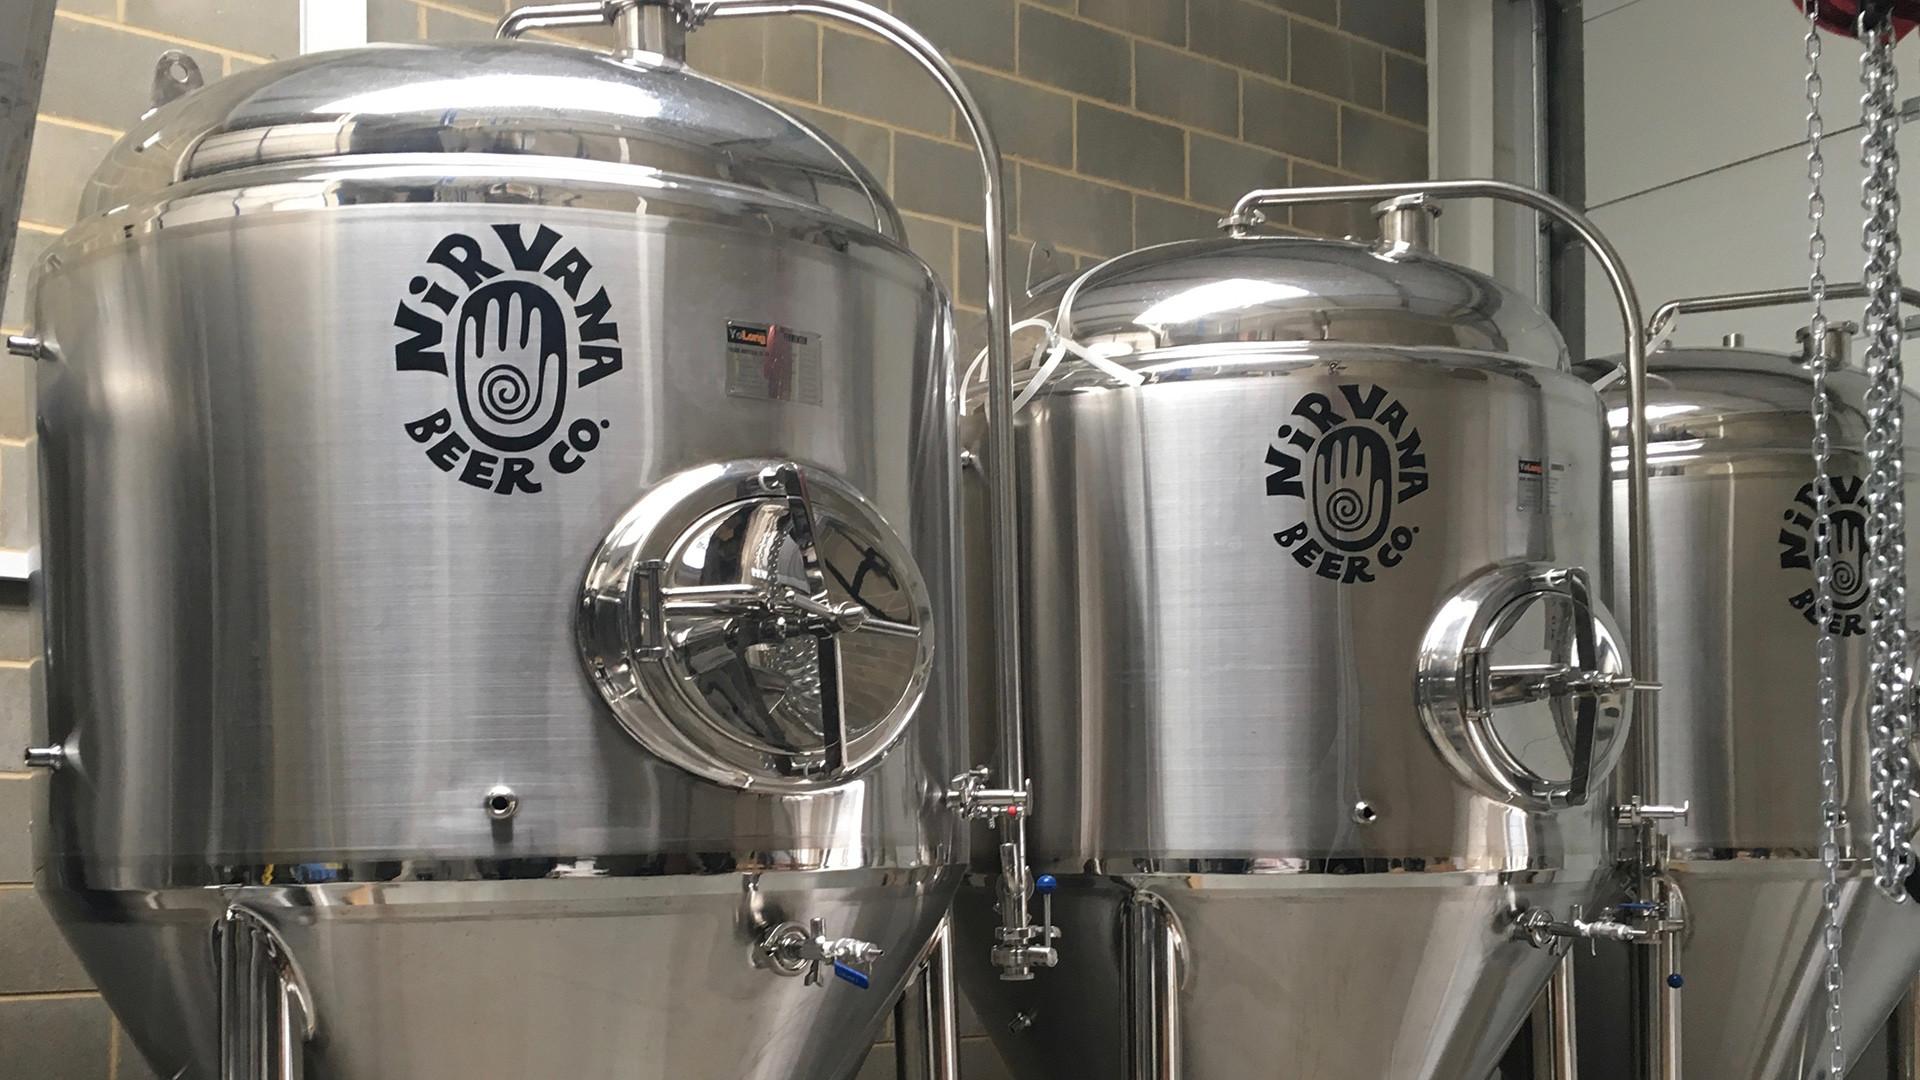 Fermenting tanks at Nirvana Beer Co.